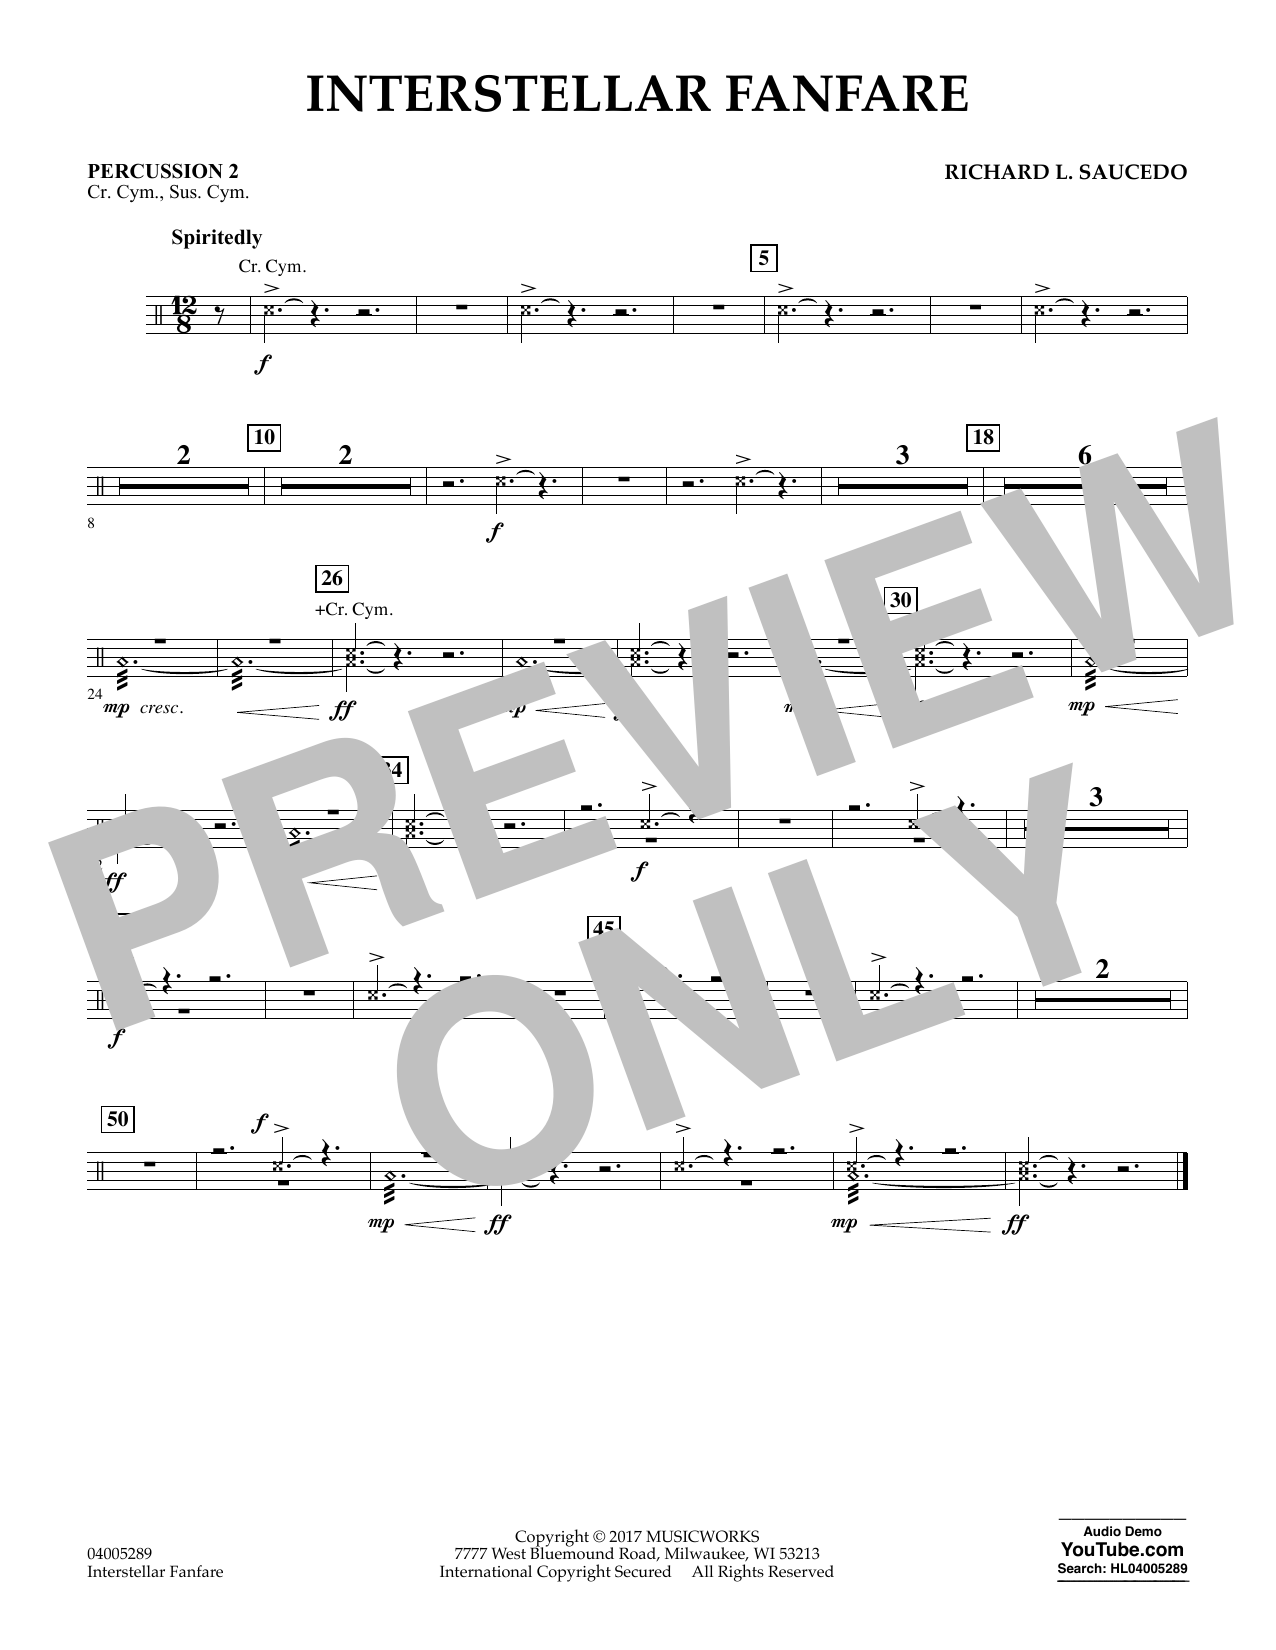 Interstellar Fanfare - Percussion 2 (Concert Band)